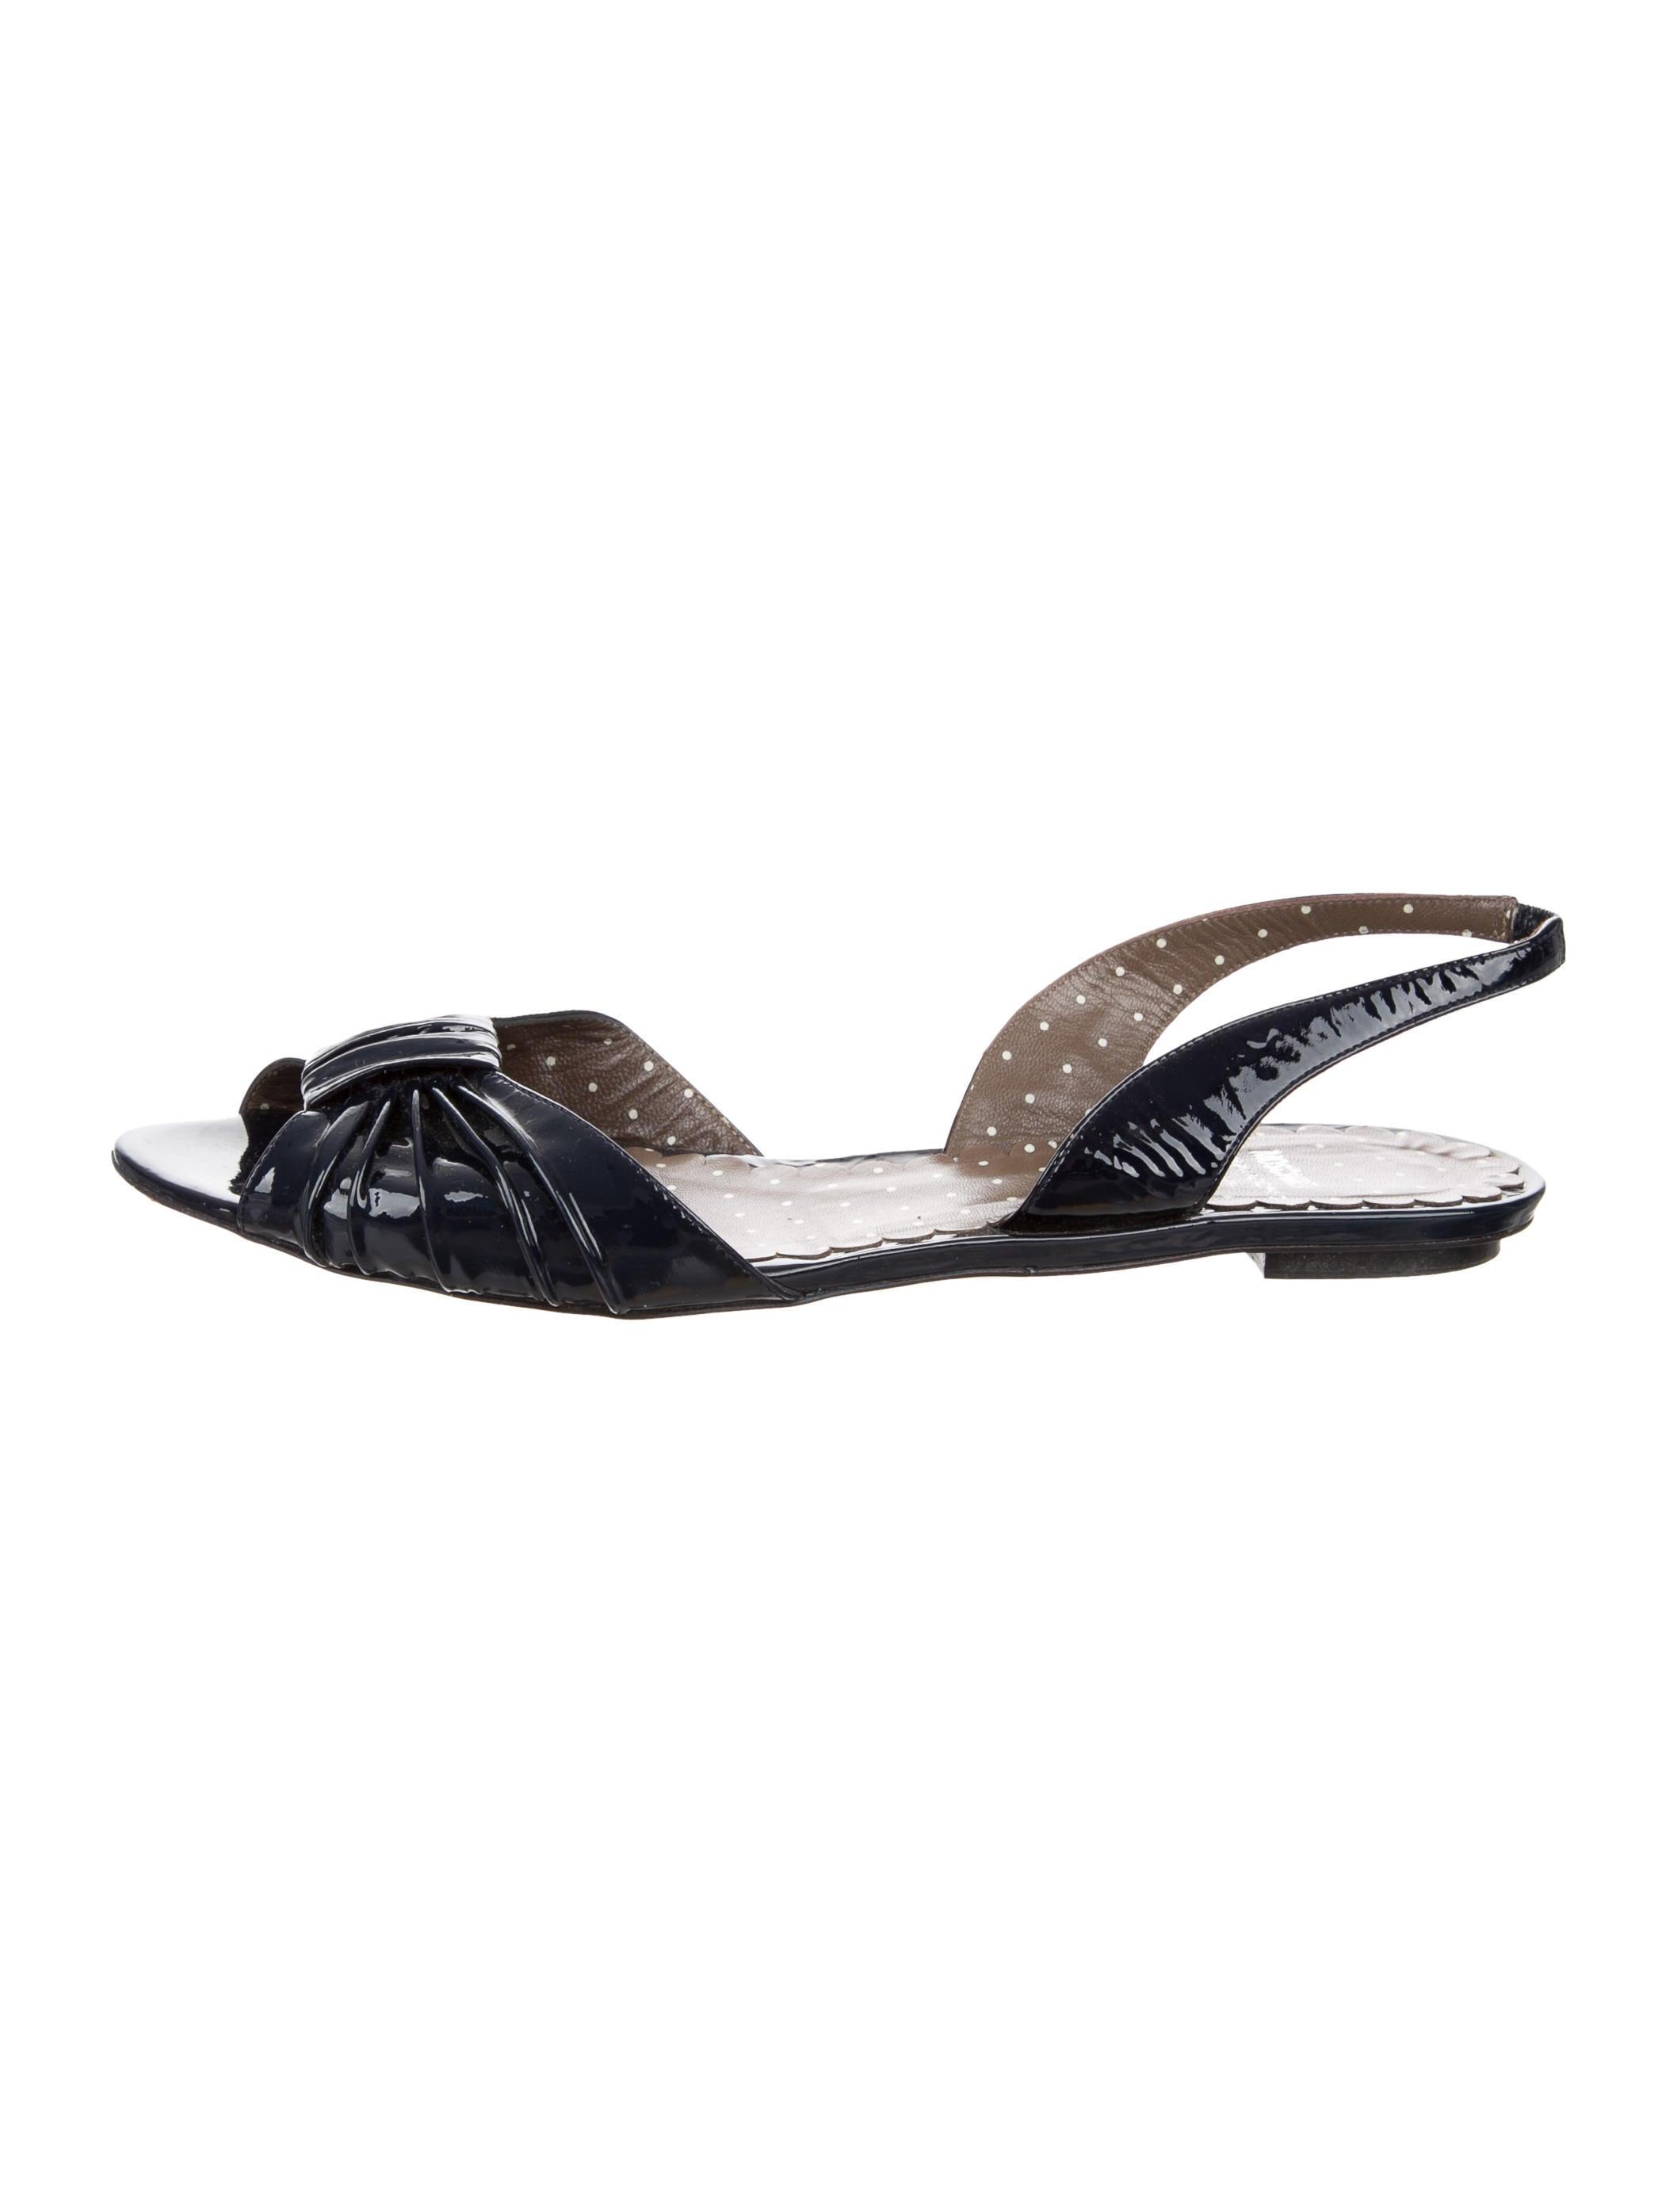 Moschino Cheap and Chic Peep-Toe Slingback Flats